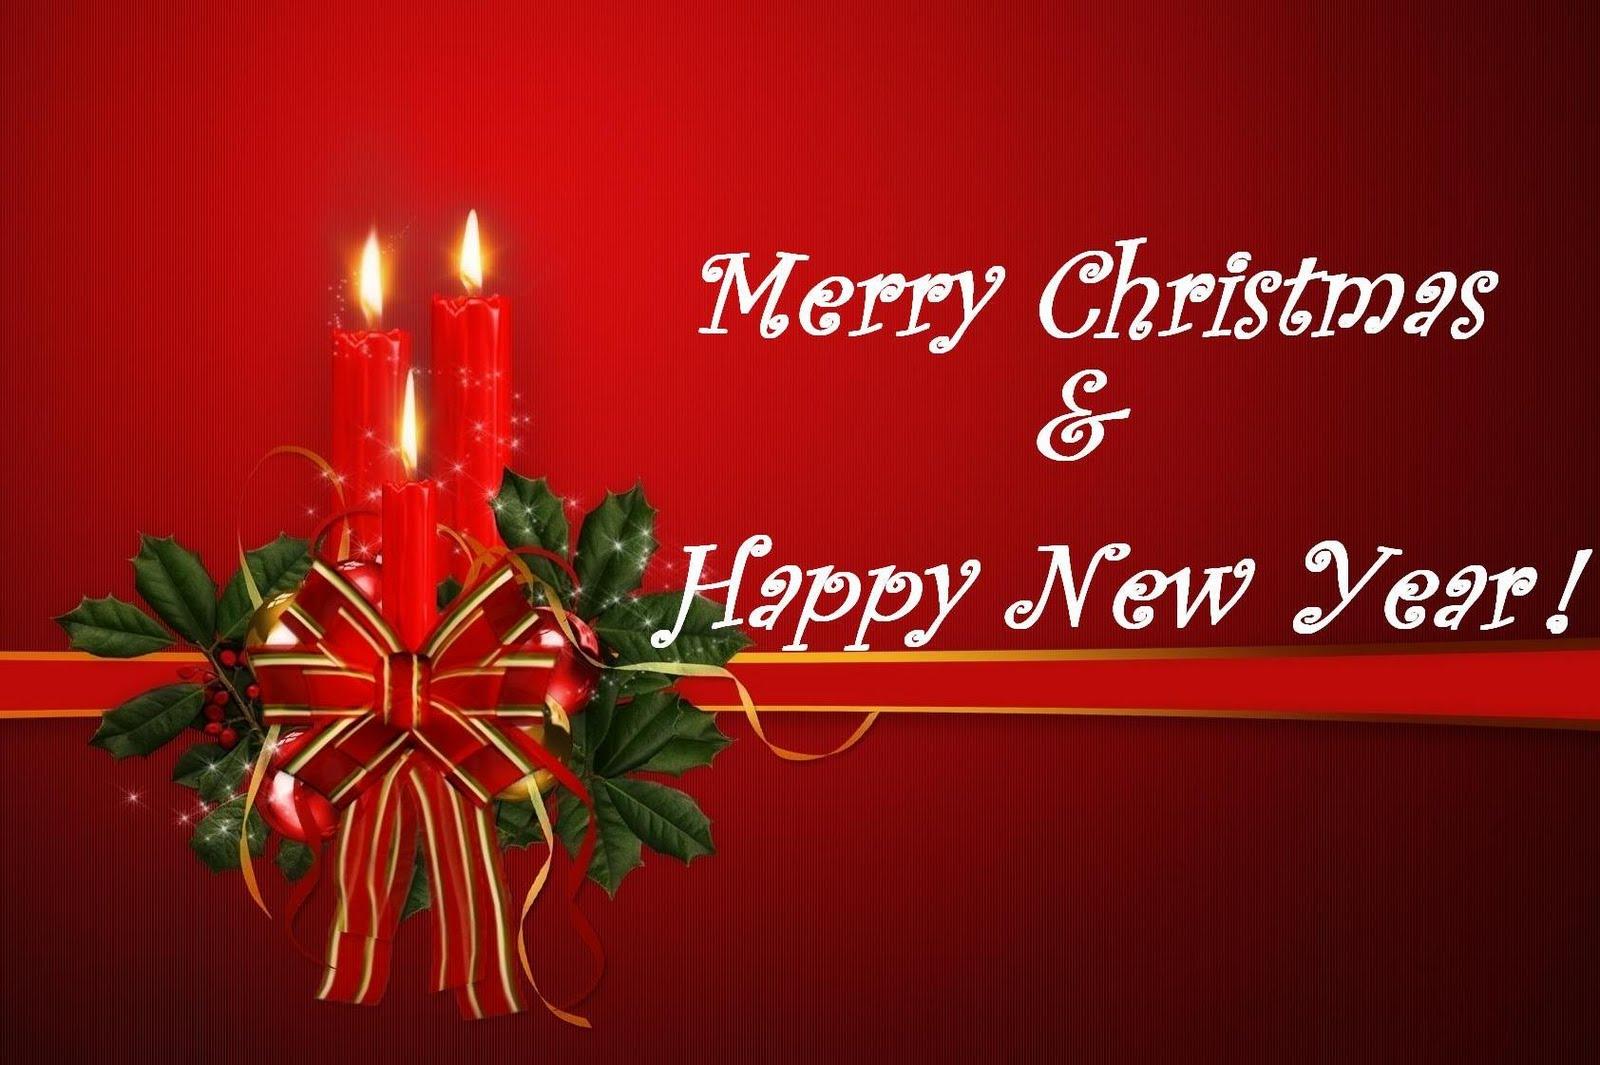 Frasi Di Natale Inglese.Frasi Di Buon Natale In Inglese Frismarketingadvies